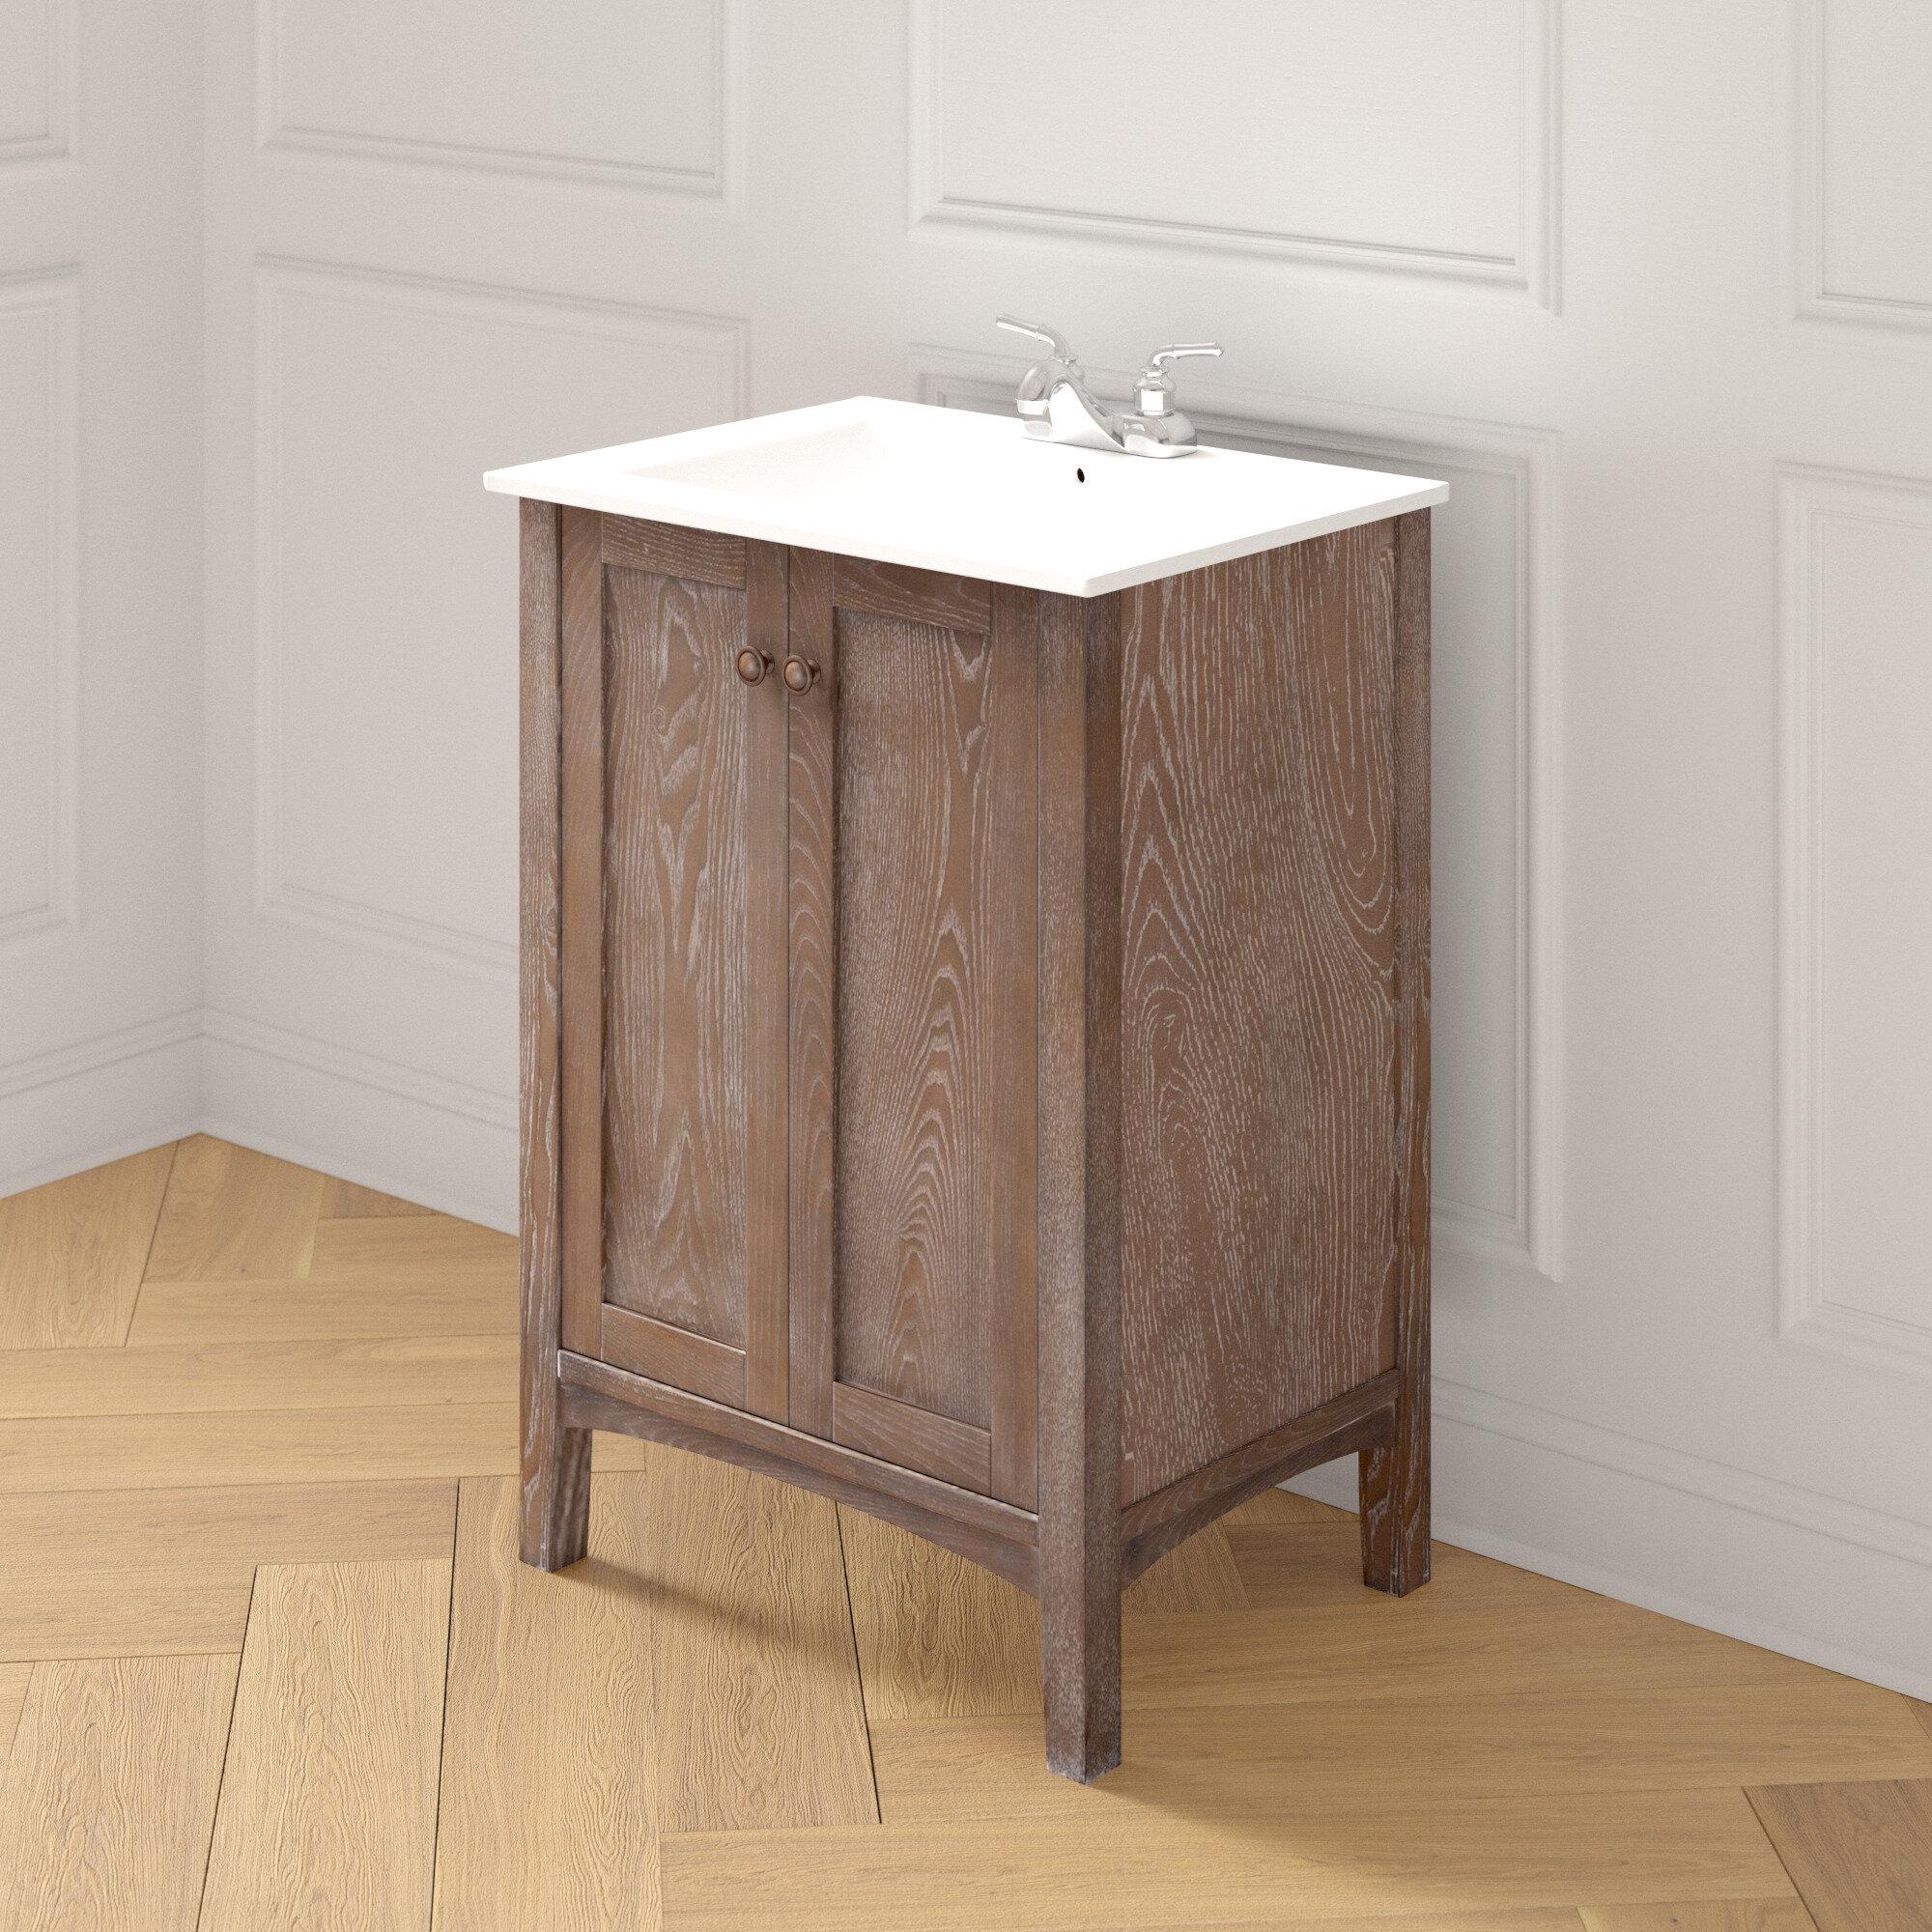 Miltonsburg 24 Single Bathroom Vanity Set Reviews Joss Main